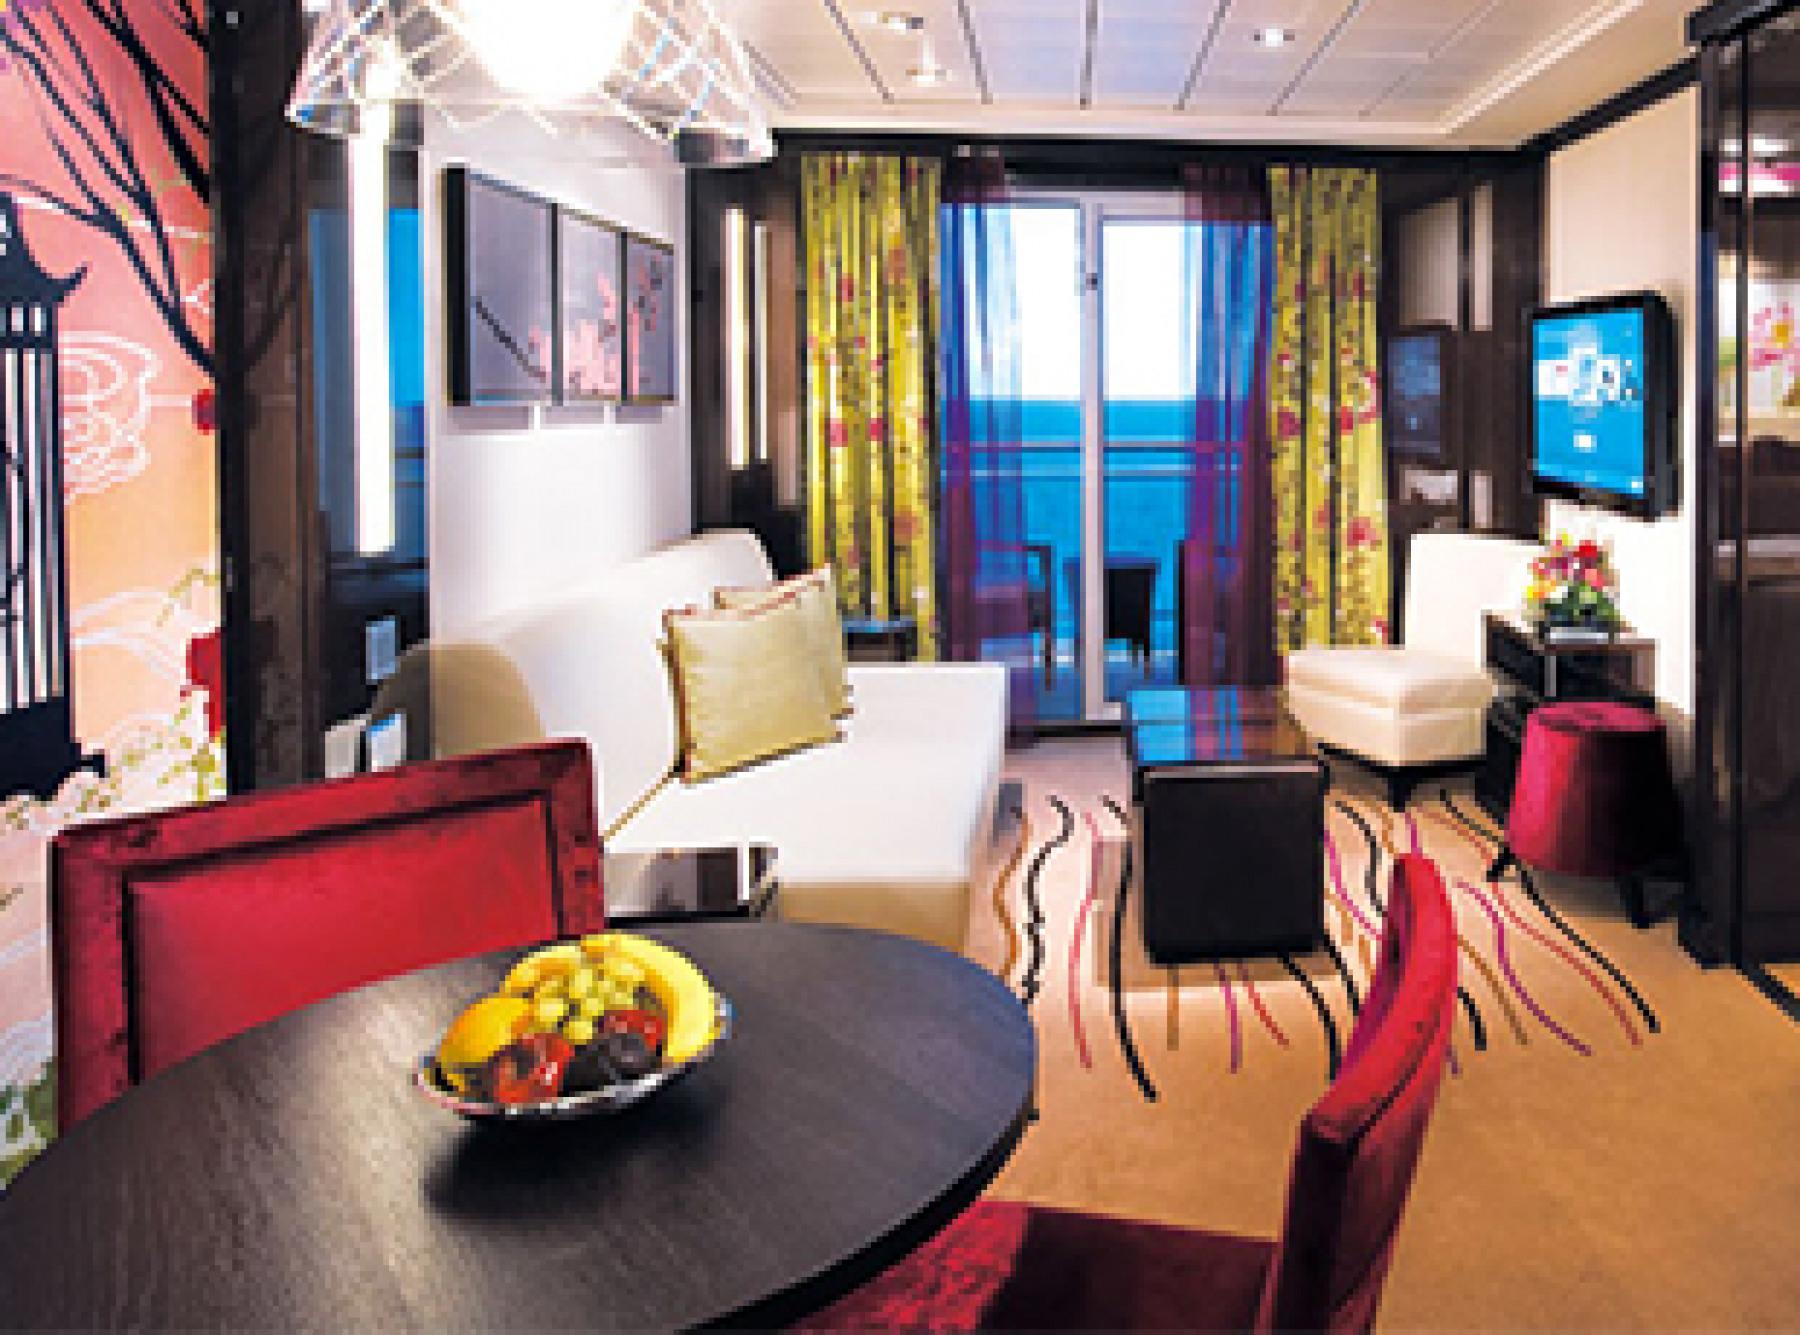 Norwegian Cruise Line Norwegian Epic Accommodation Family Villa.jpg